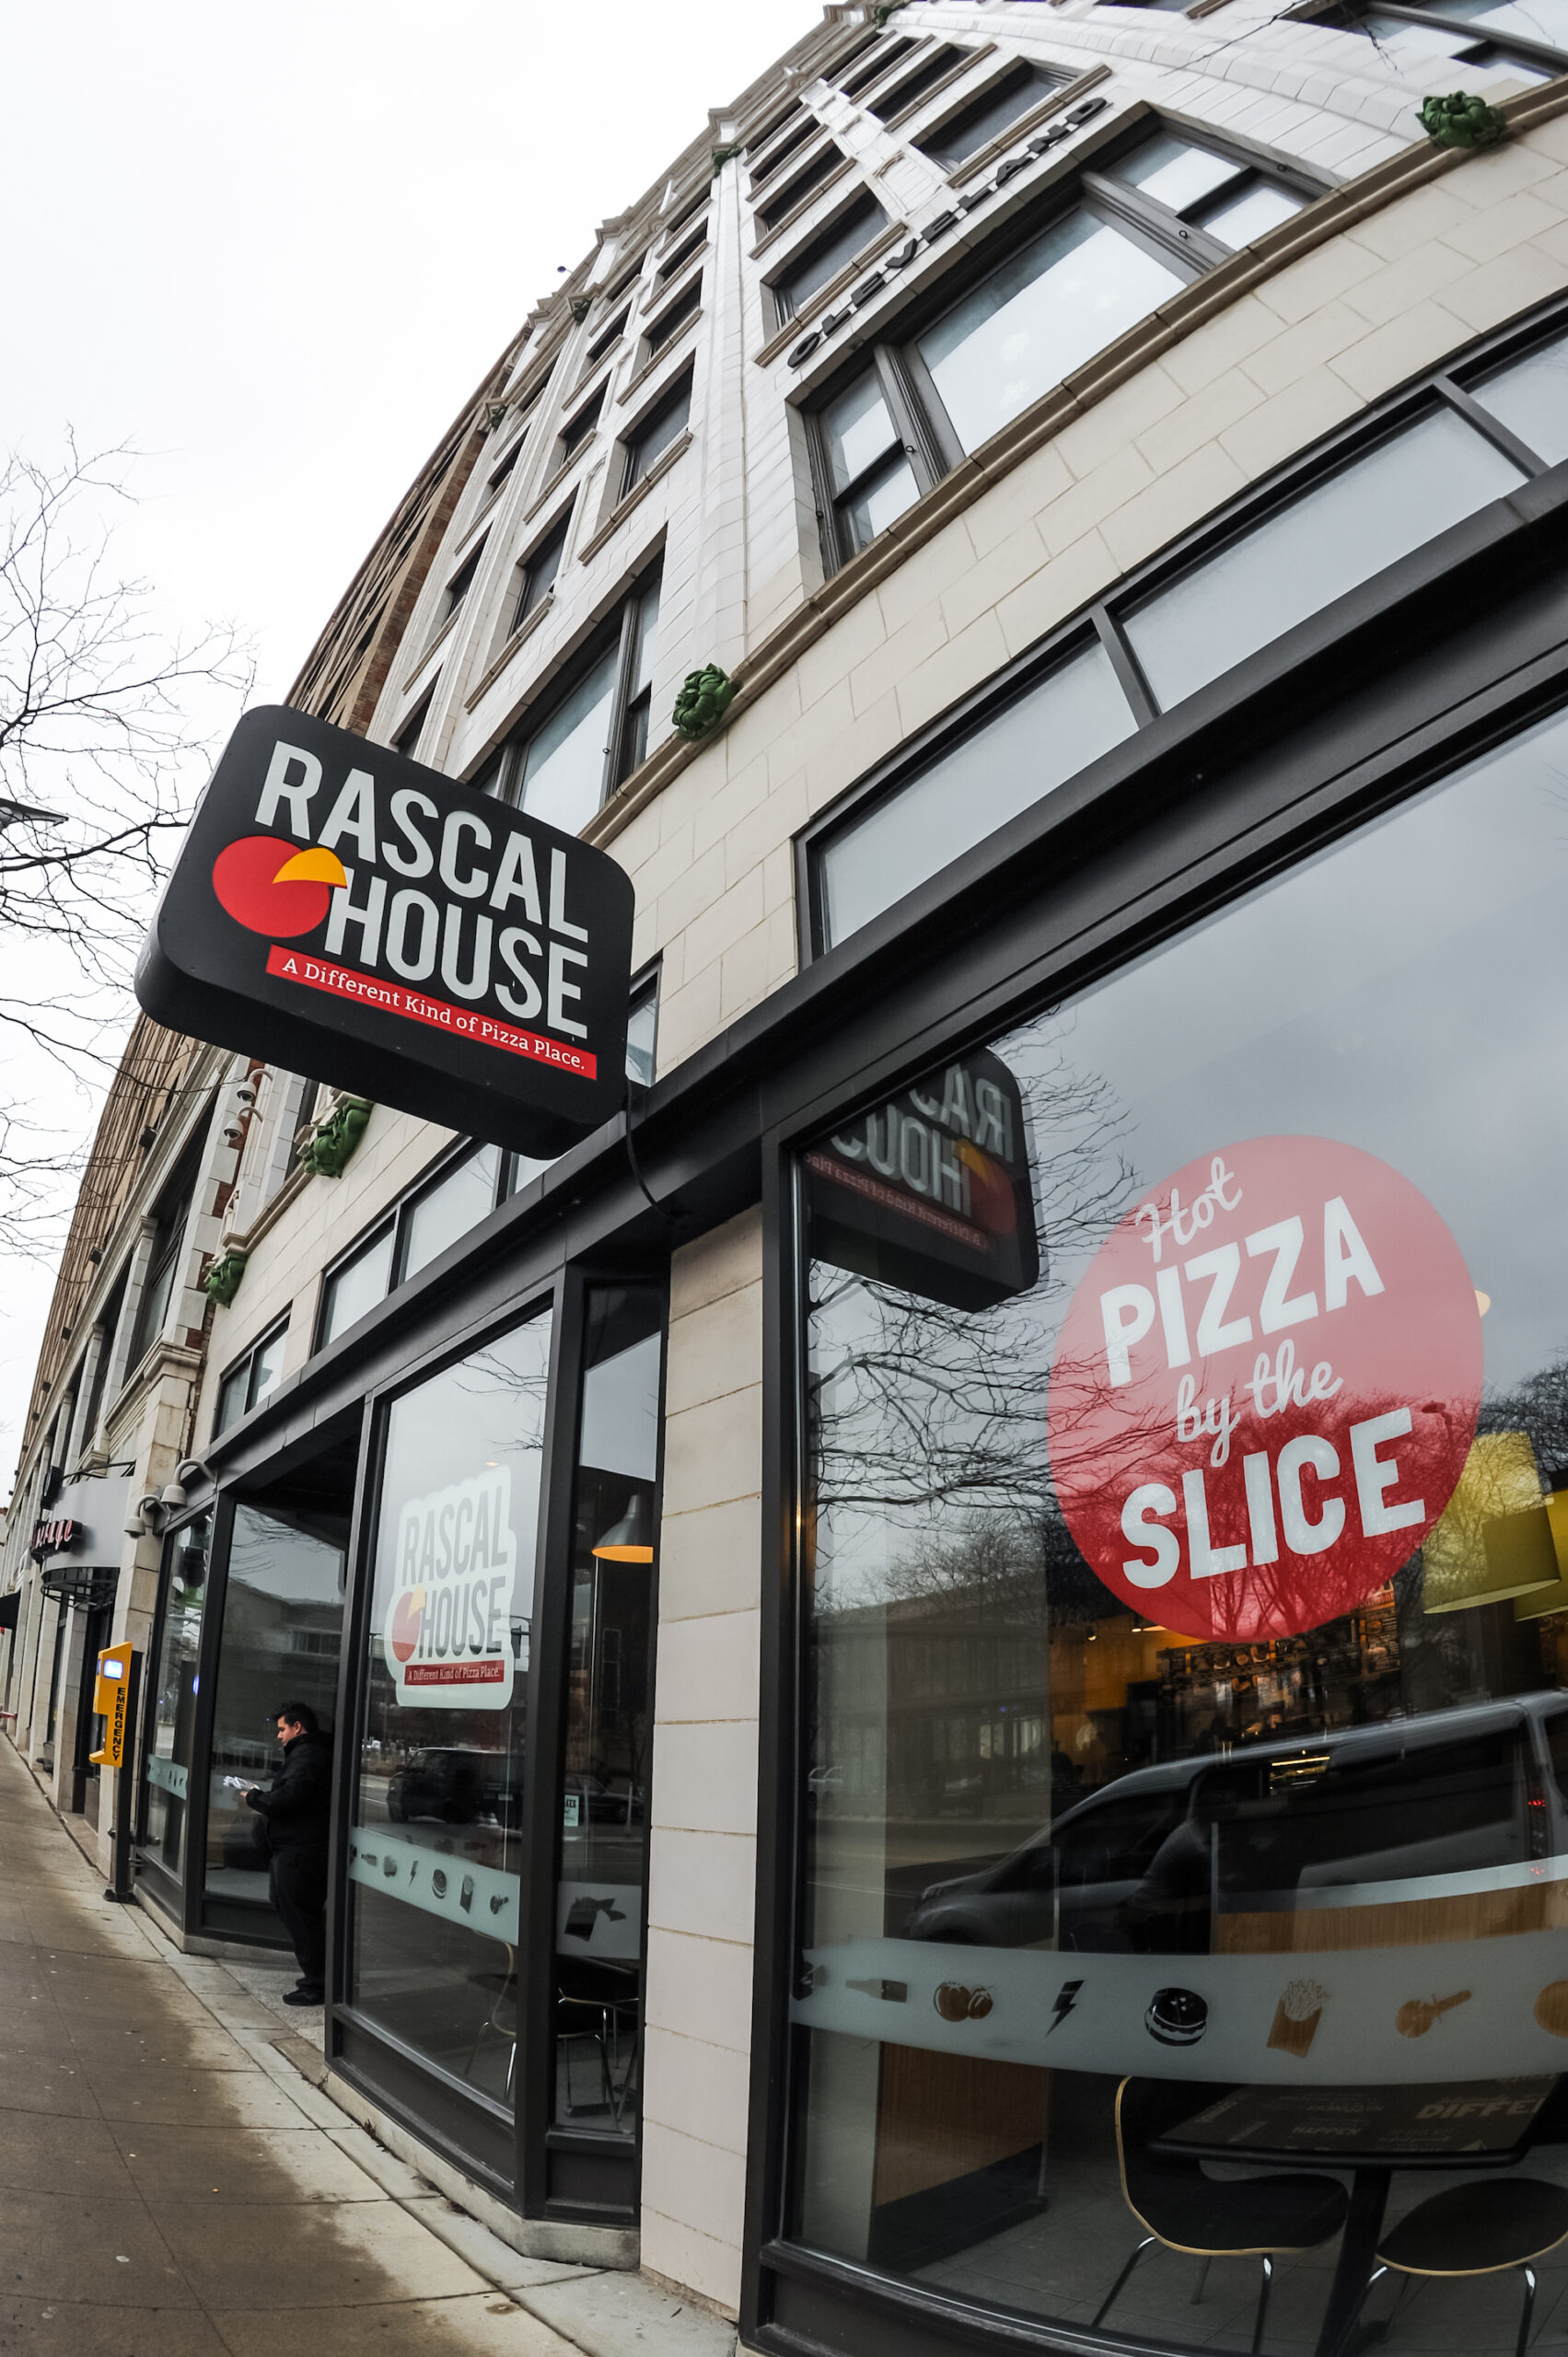 RascalHousePizza 509 scaled